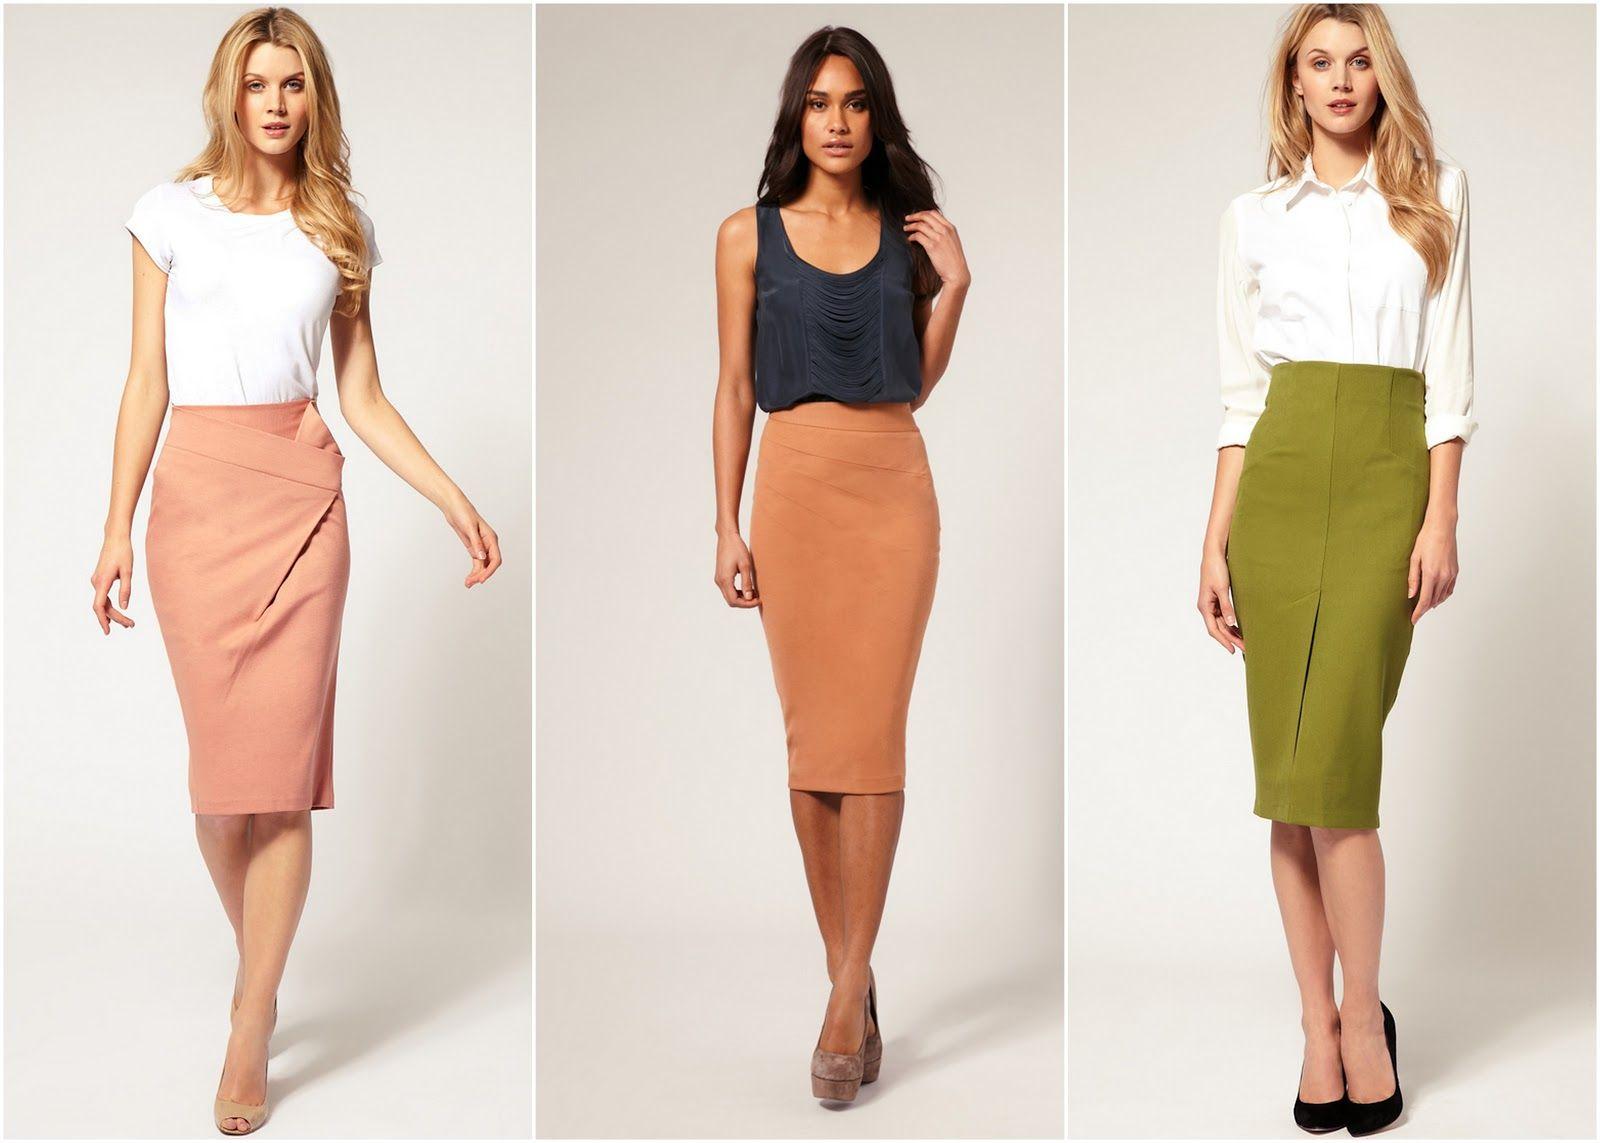 Denim Pencil Skirt Below Knee 2014-2015 | Fashion Trends 2014-2015 ...